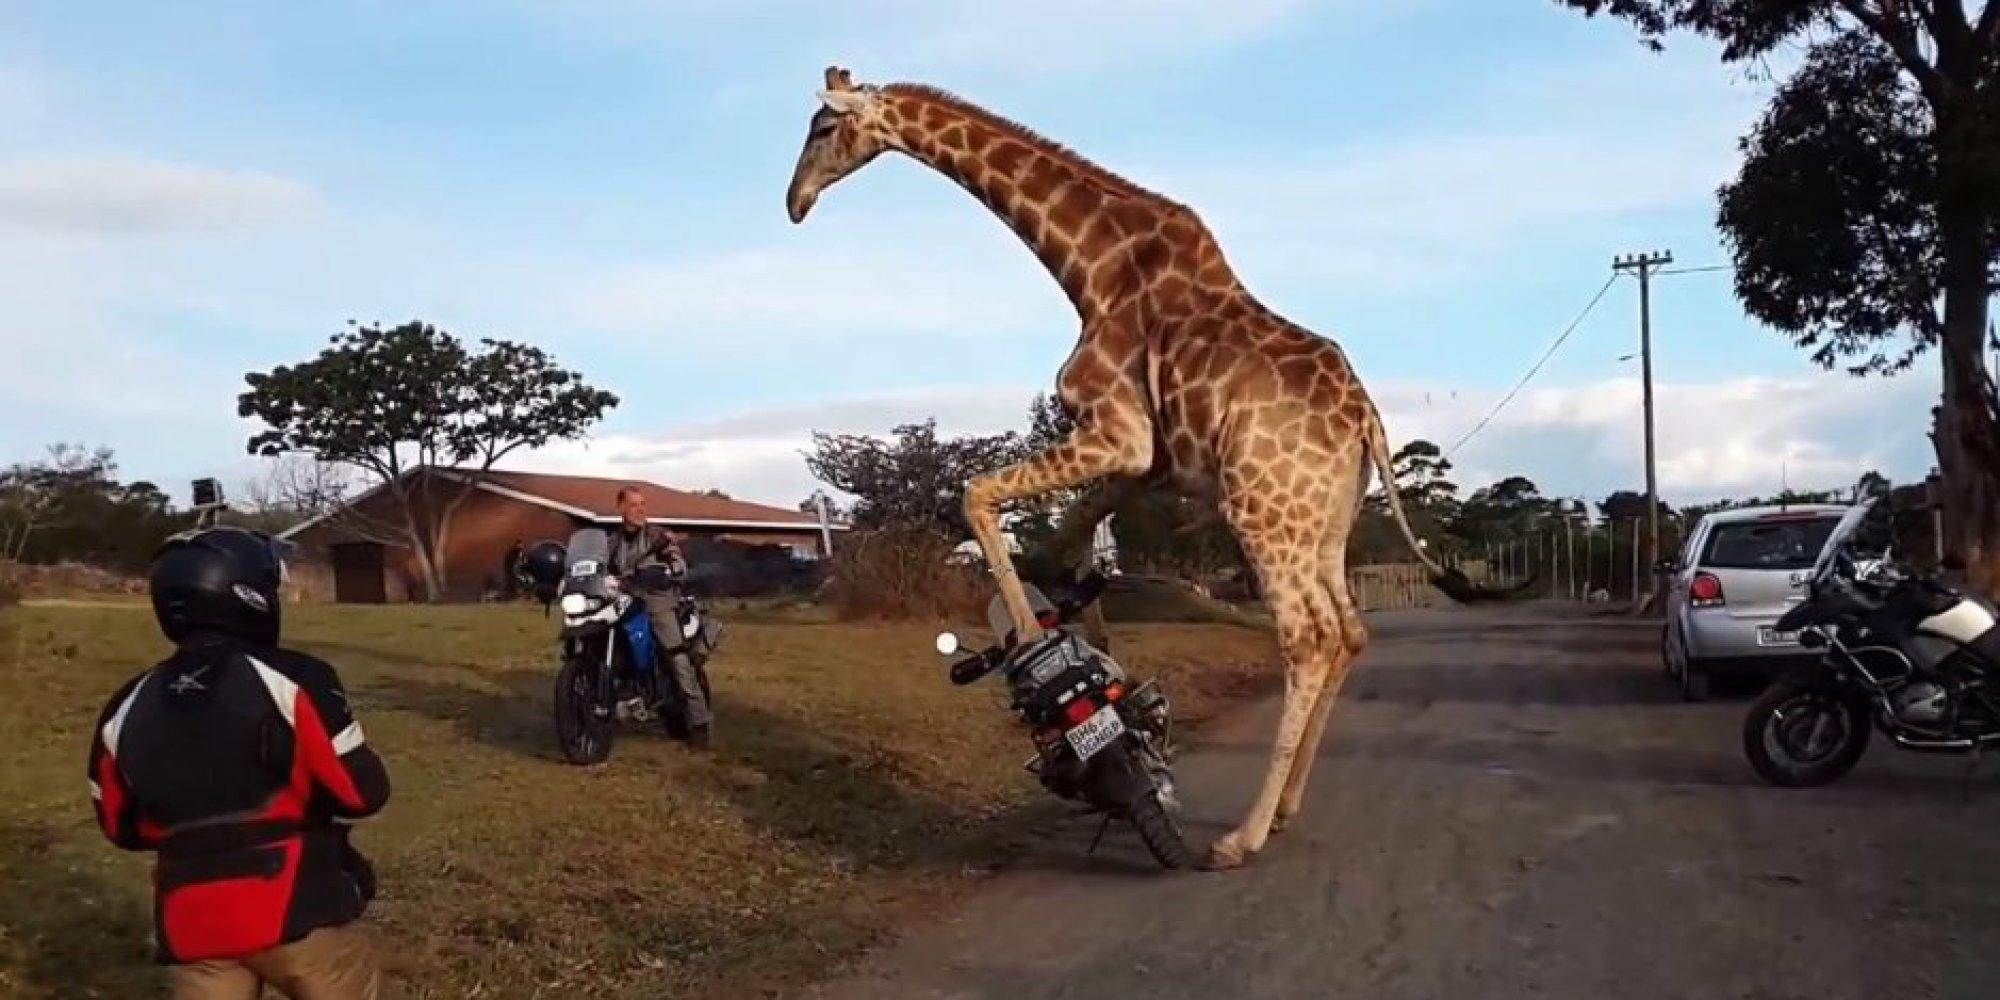 http://i.huffpost.com/gen/1991287/images/o-GIRAFFE-MOTORCYCLE-facebook.jpg